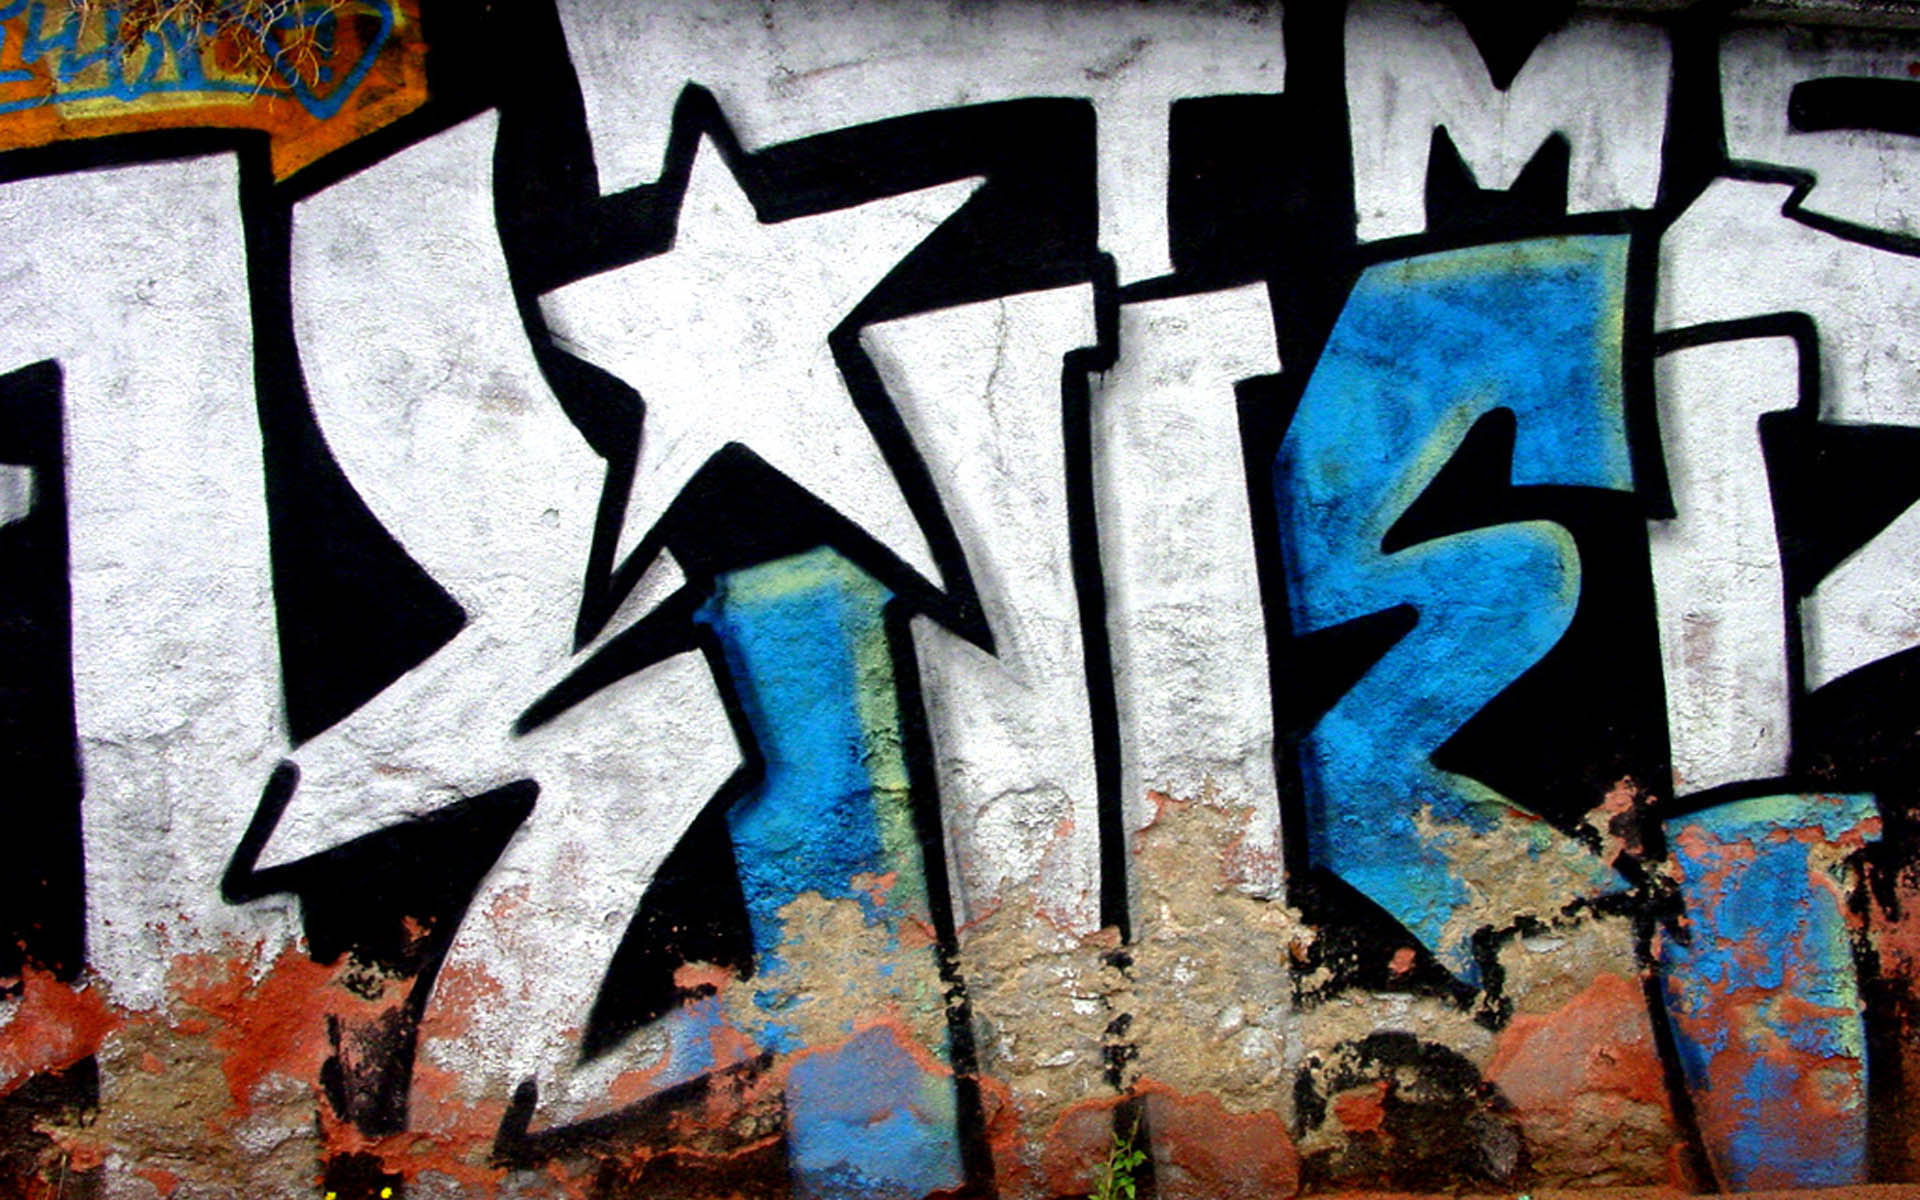 Graffiti wallpaper hd for Immagini graffiti hd